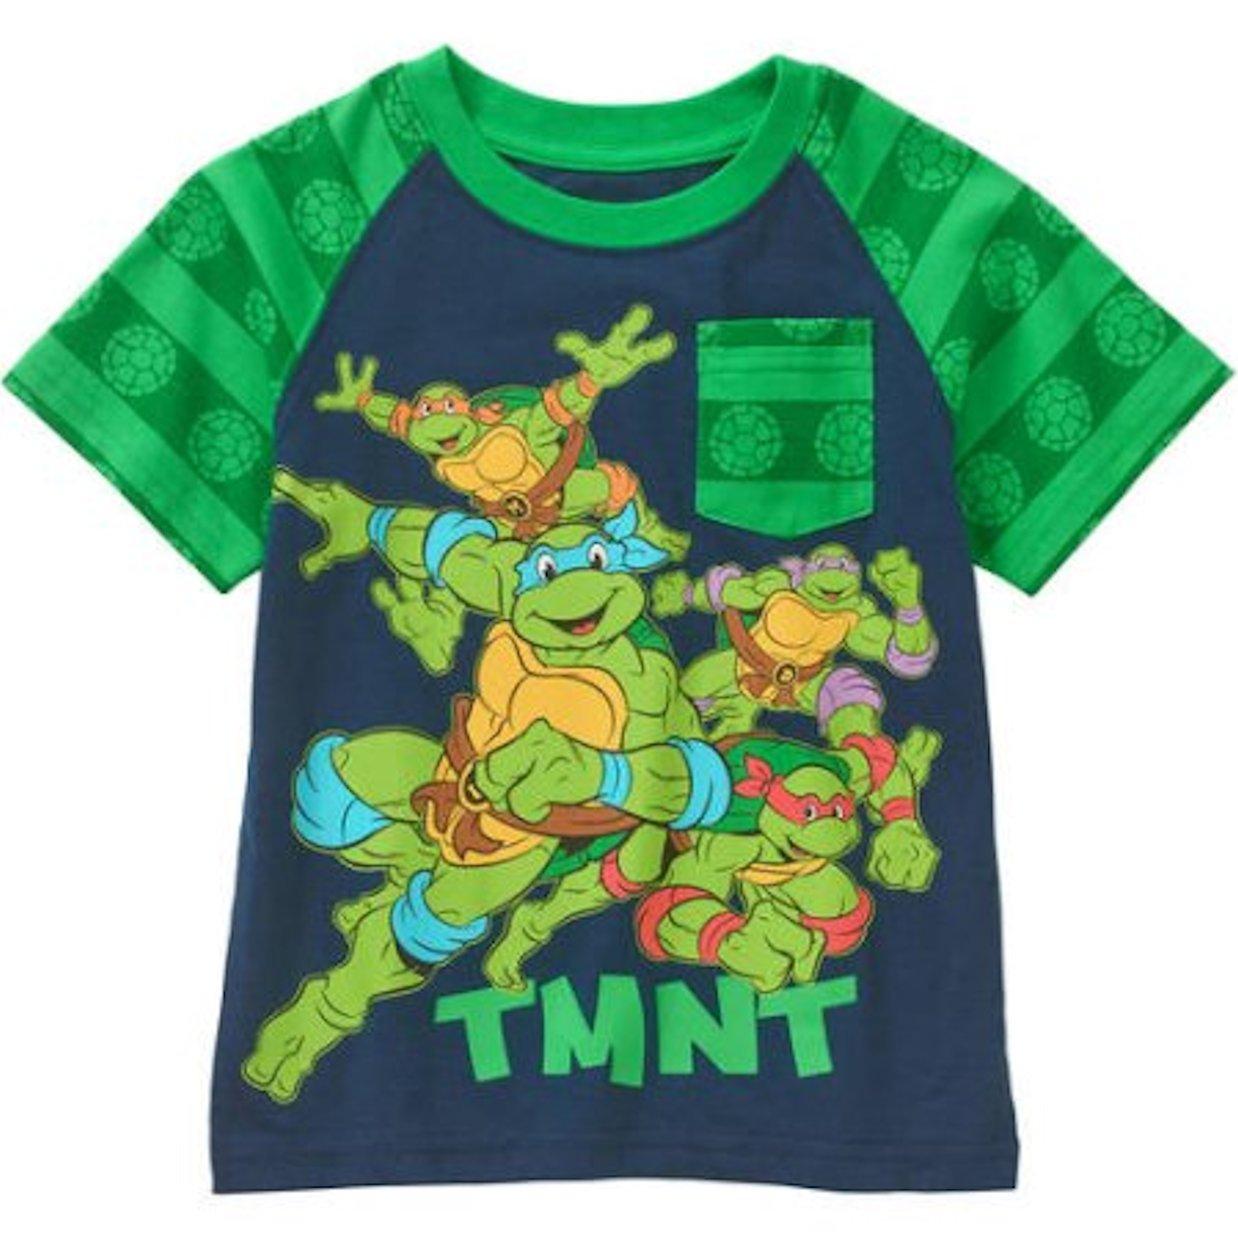 acbd0f0b0 Amazon.com: Toddler Boys Teenage Mutant Ninja Turtle Pocket Tee Shirt-Size  2T-4T: Clothing